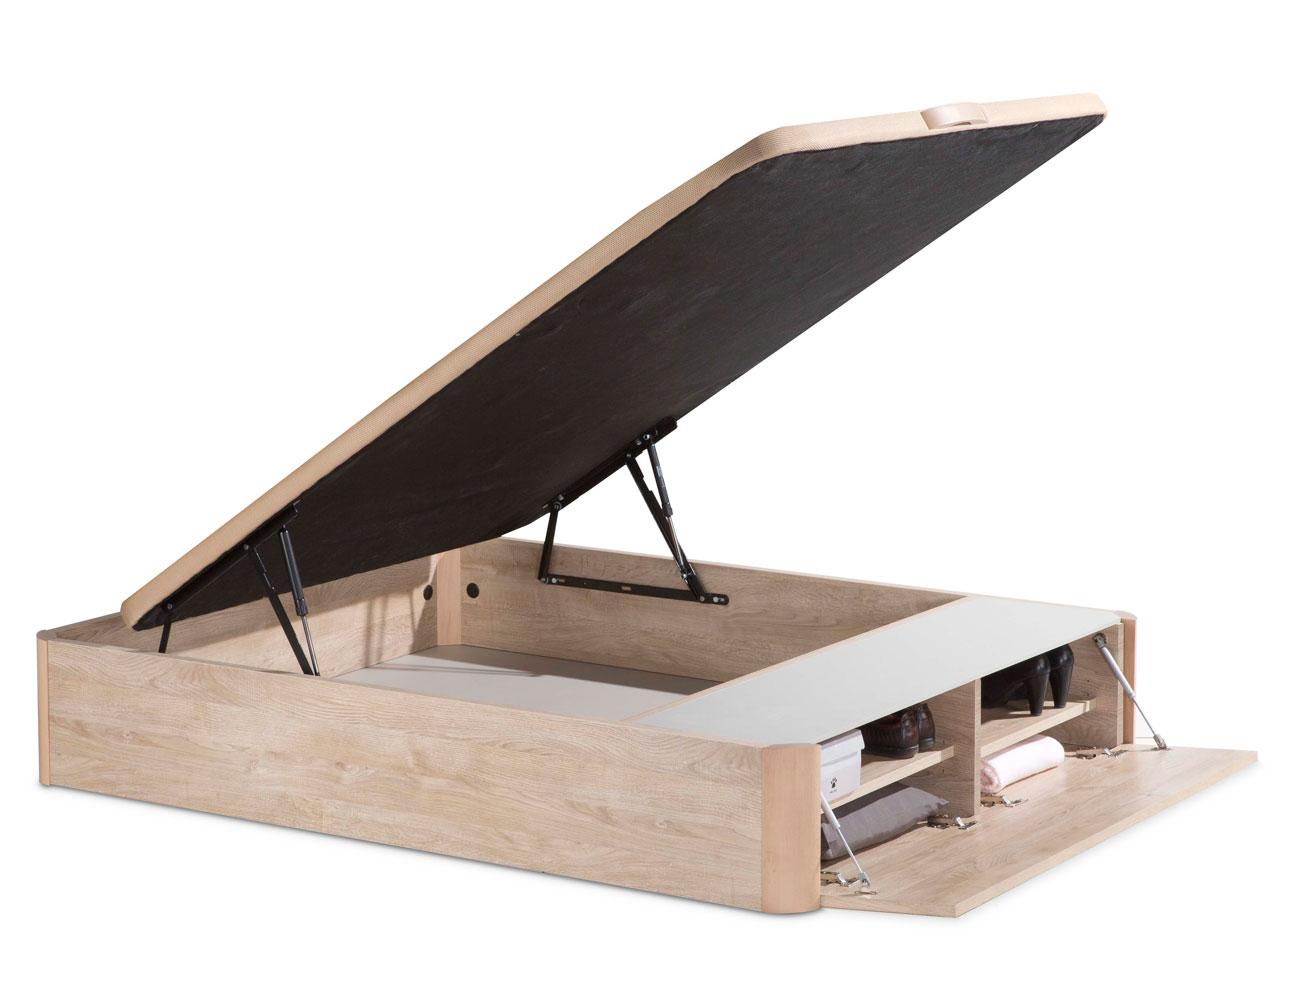 Canape zapatero madera tapa 3d 7615